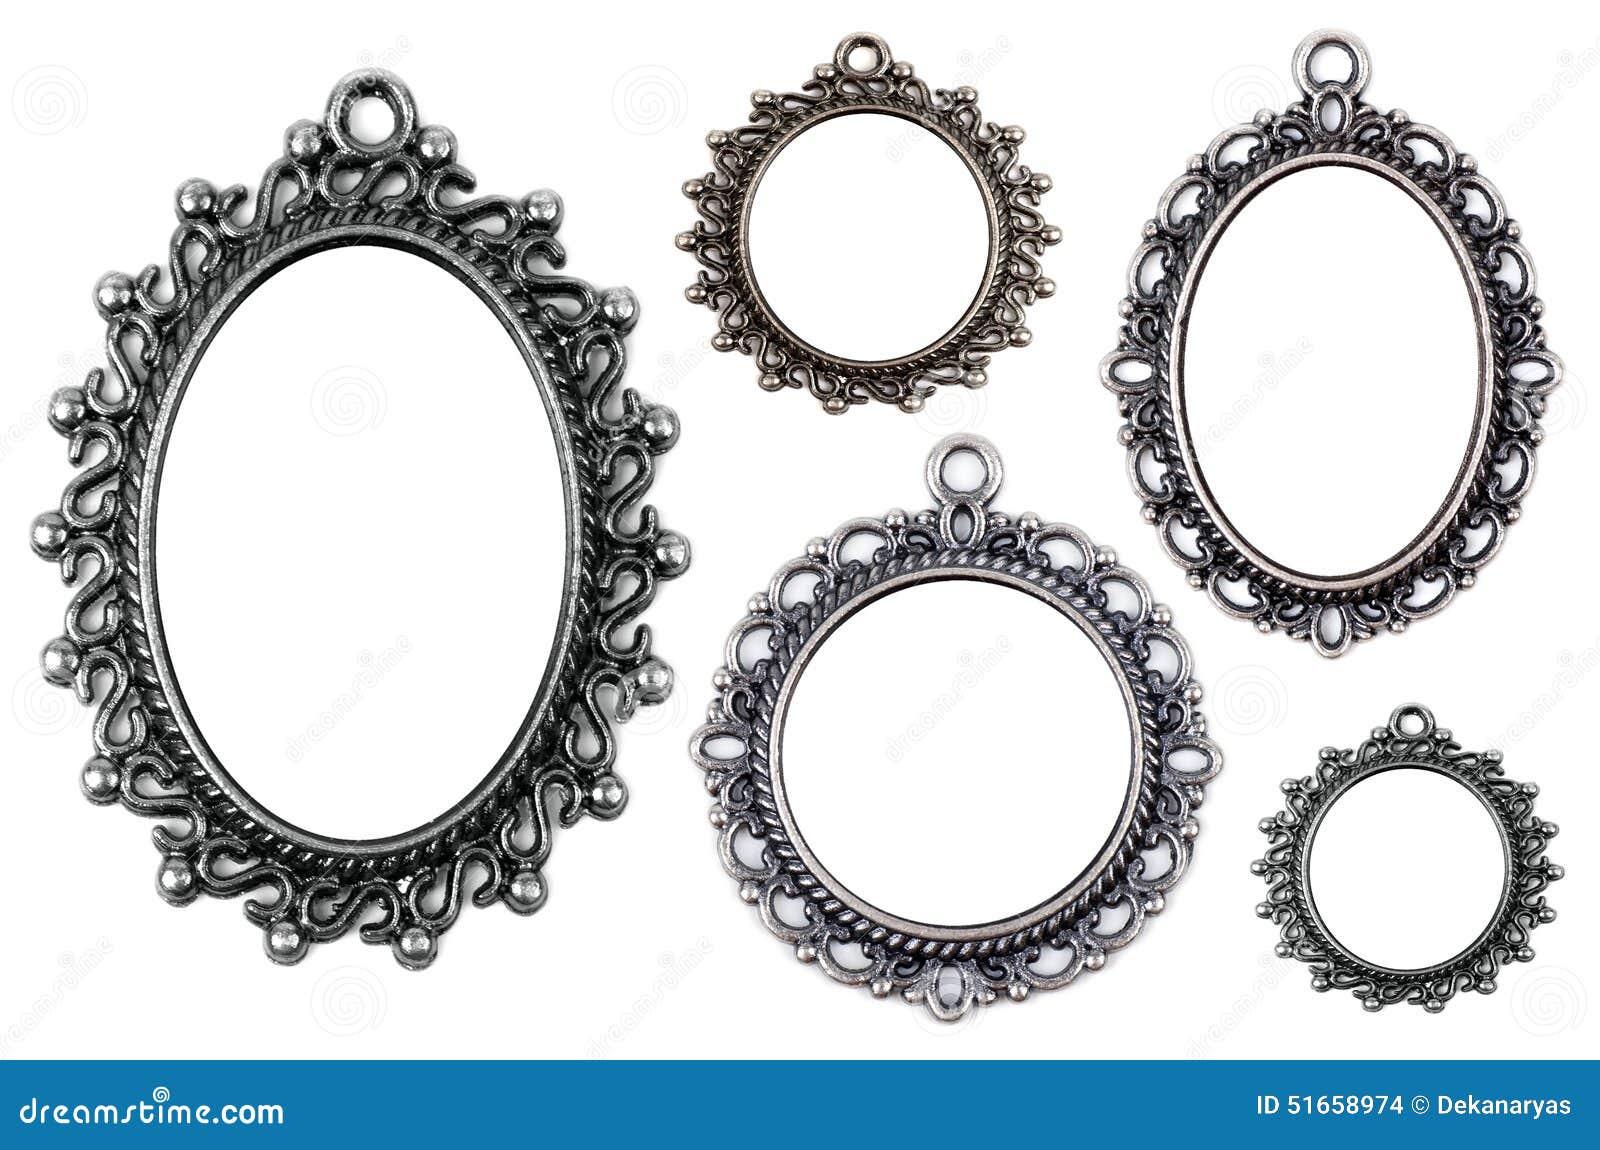 Vintage Metal Medallion Frames Isolated Stock Photo